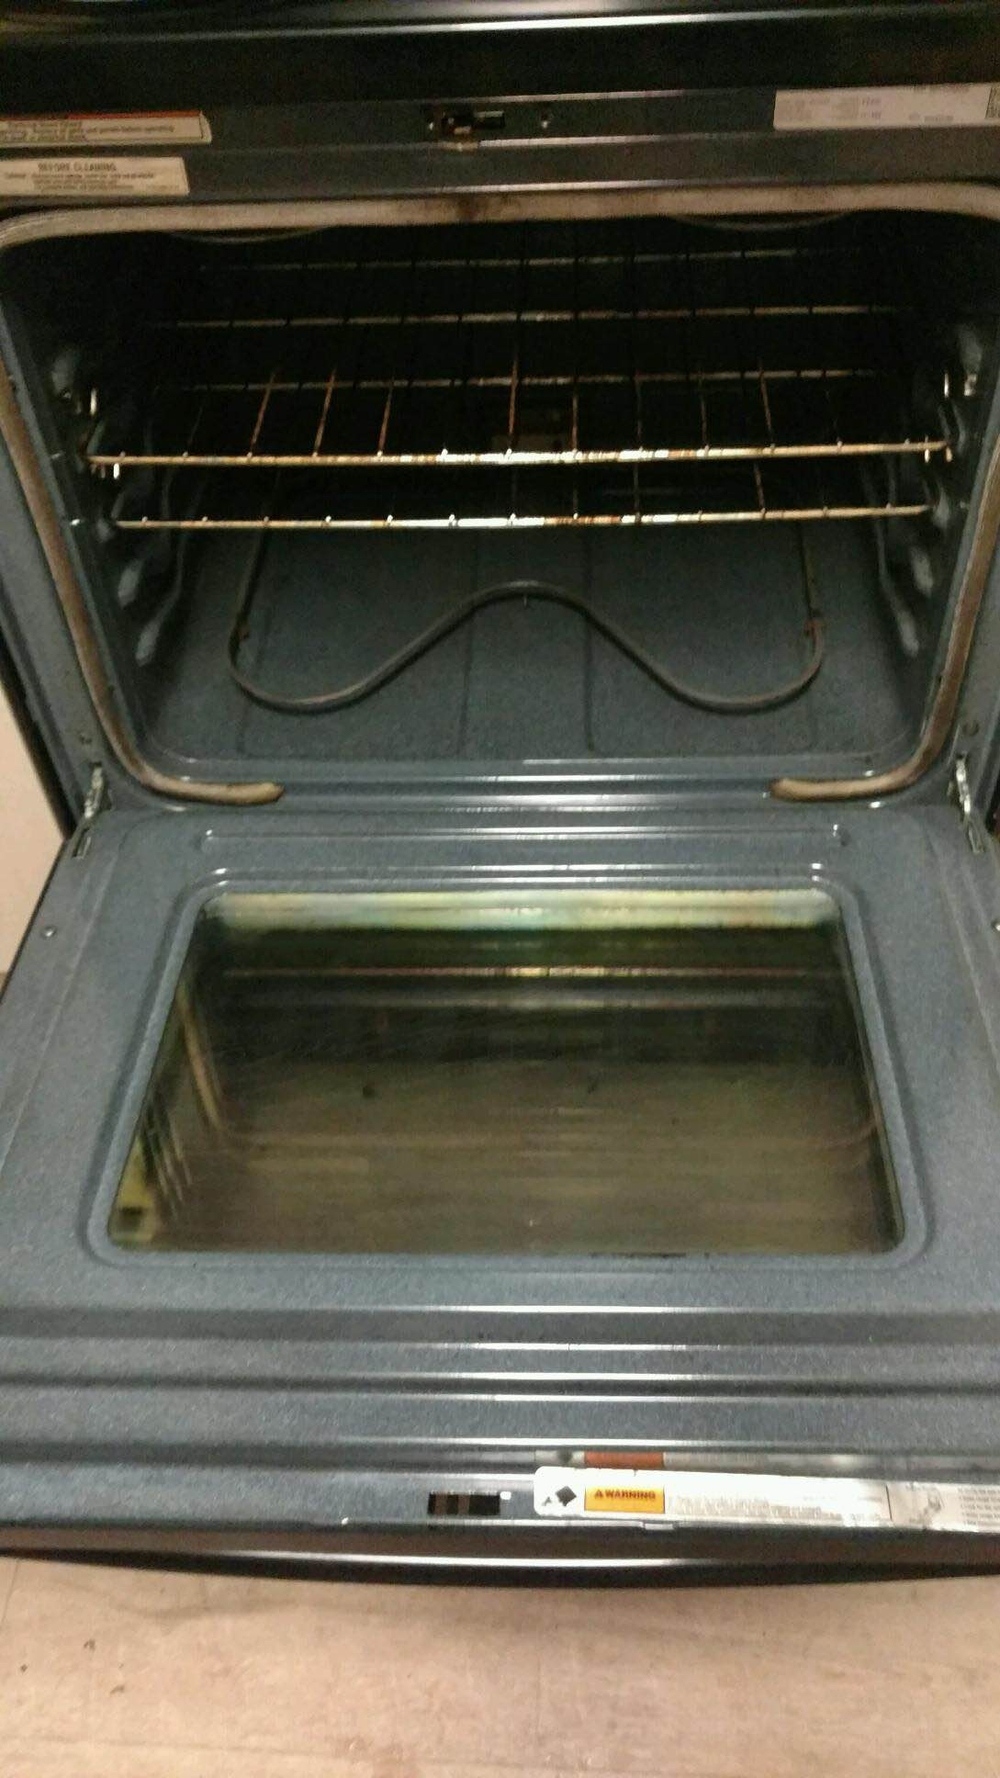 Clean Oven.jpg